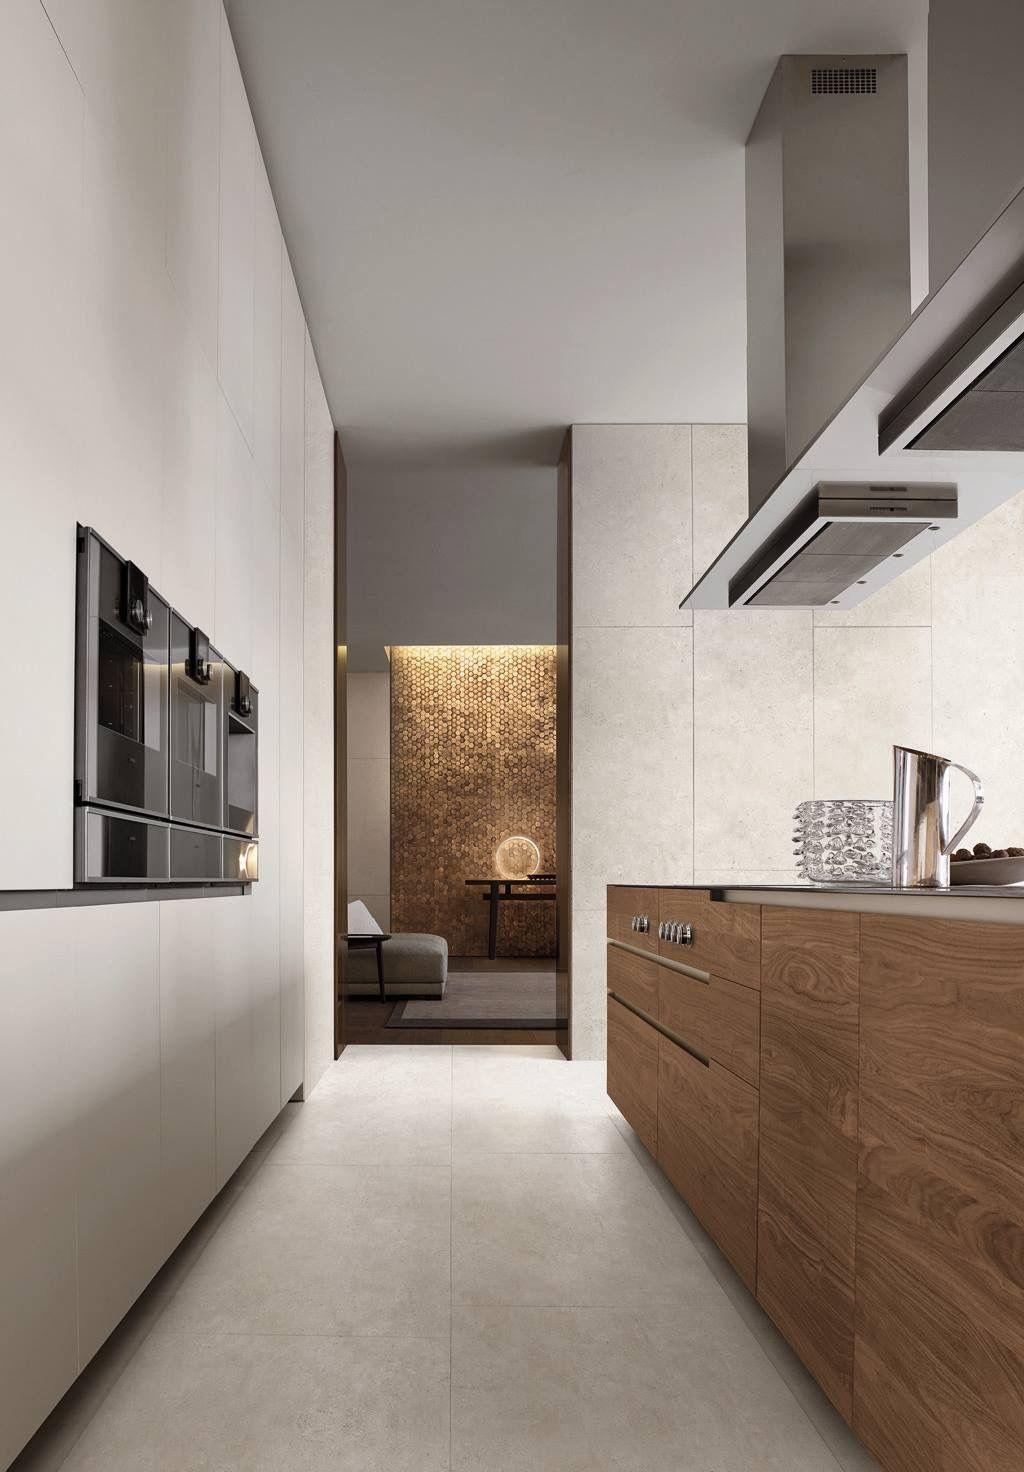 grand carrelage gris clair | house ideas. | pinterest | grau, Hause ideen